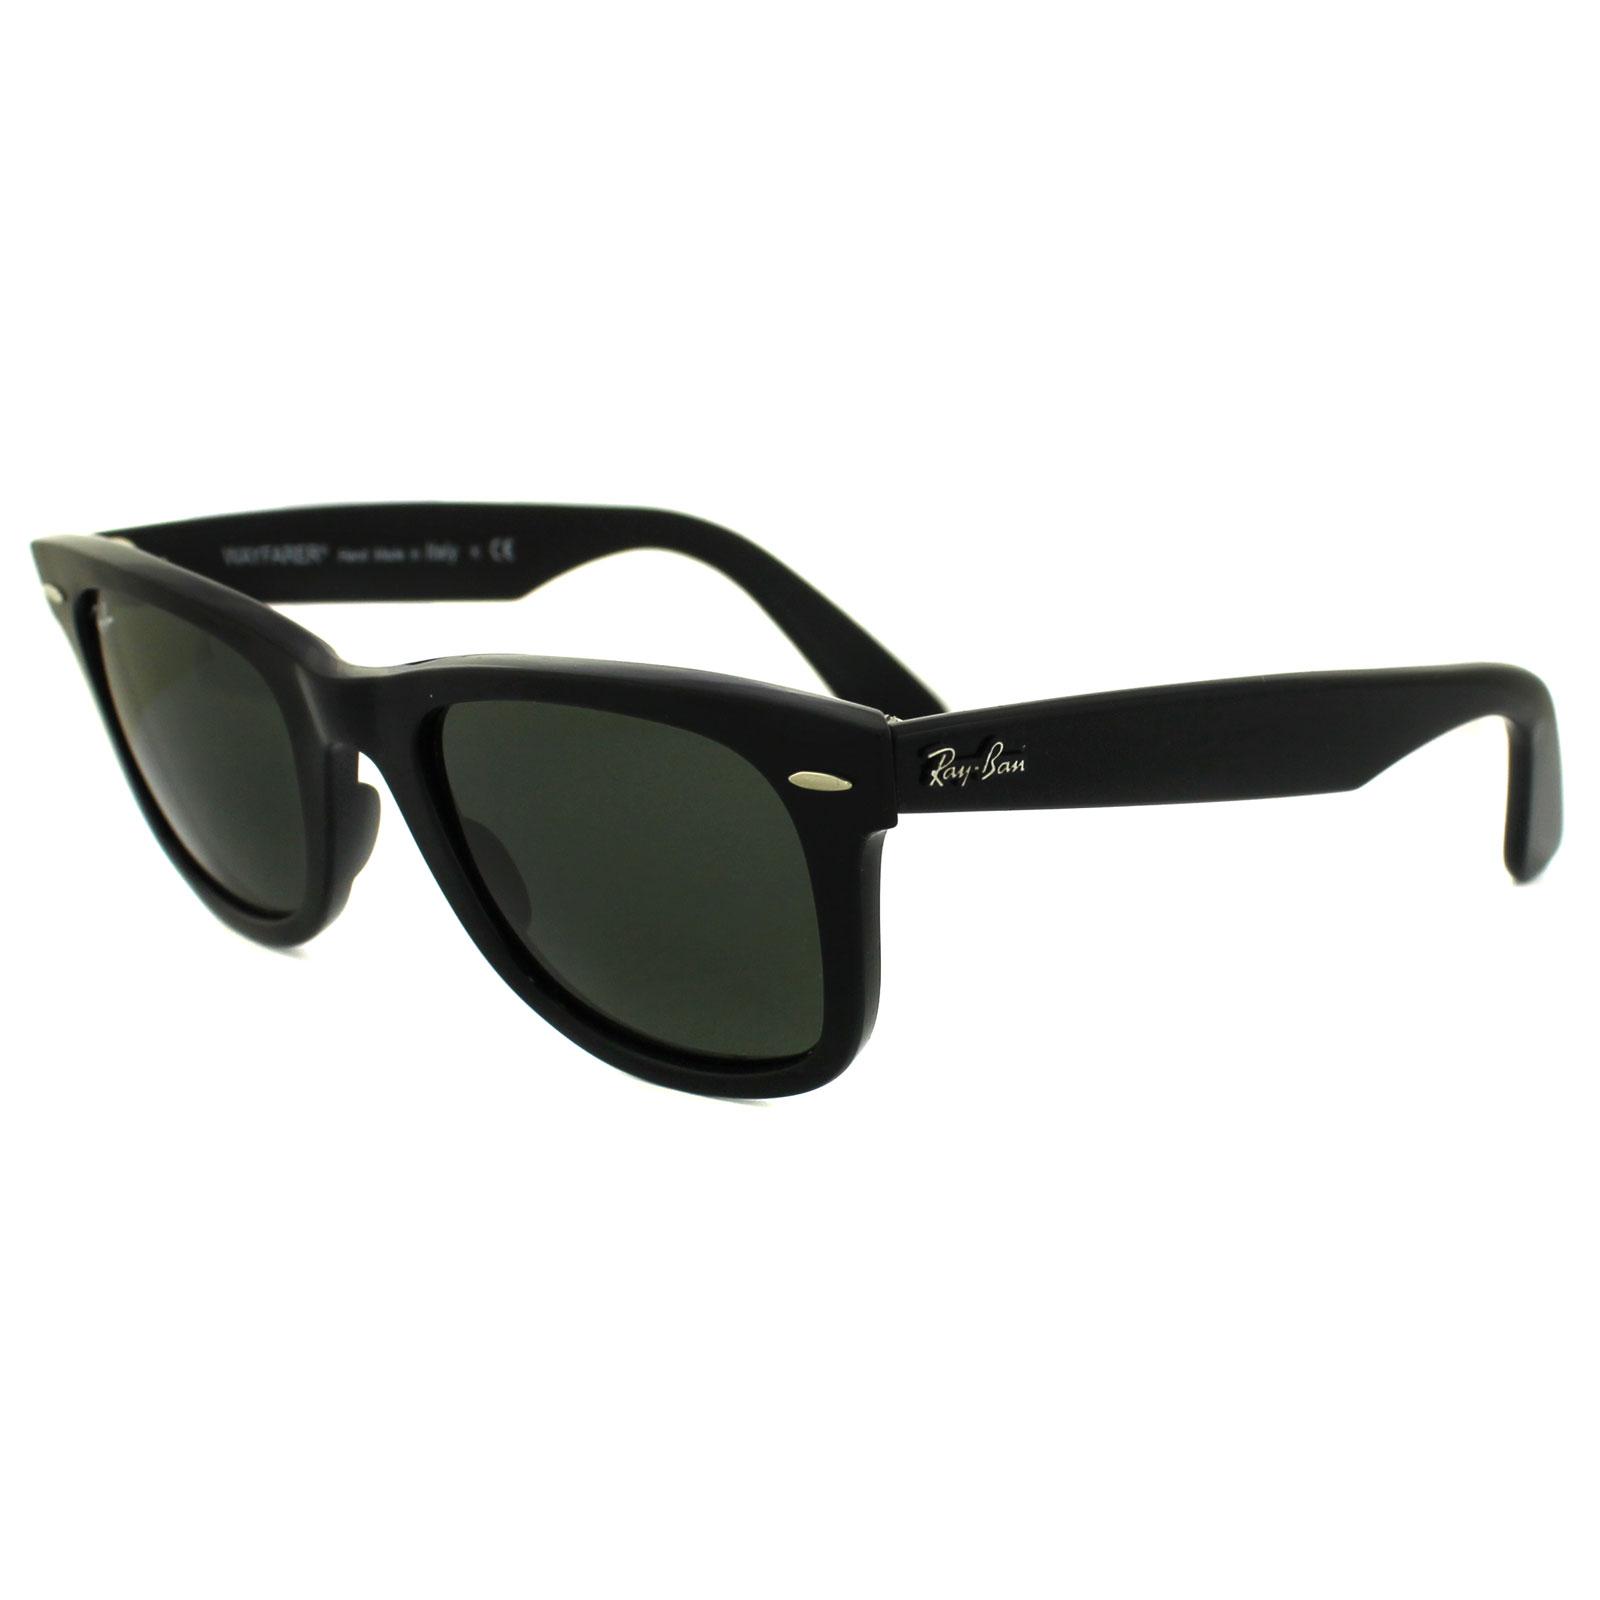 0935391220a23 CENTINELA Gafas de sol Ray-Ban Wayfarer 2140 901 negro verde G-15 mediana 50